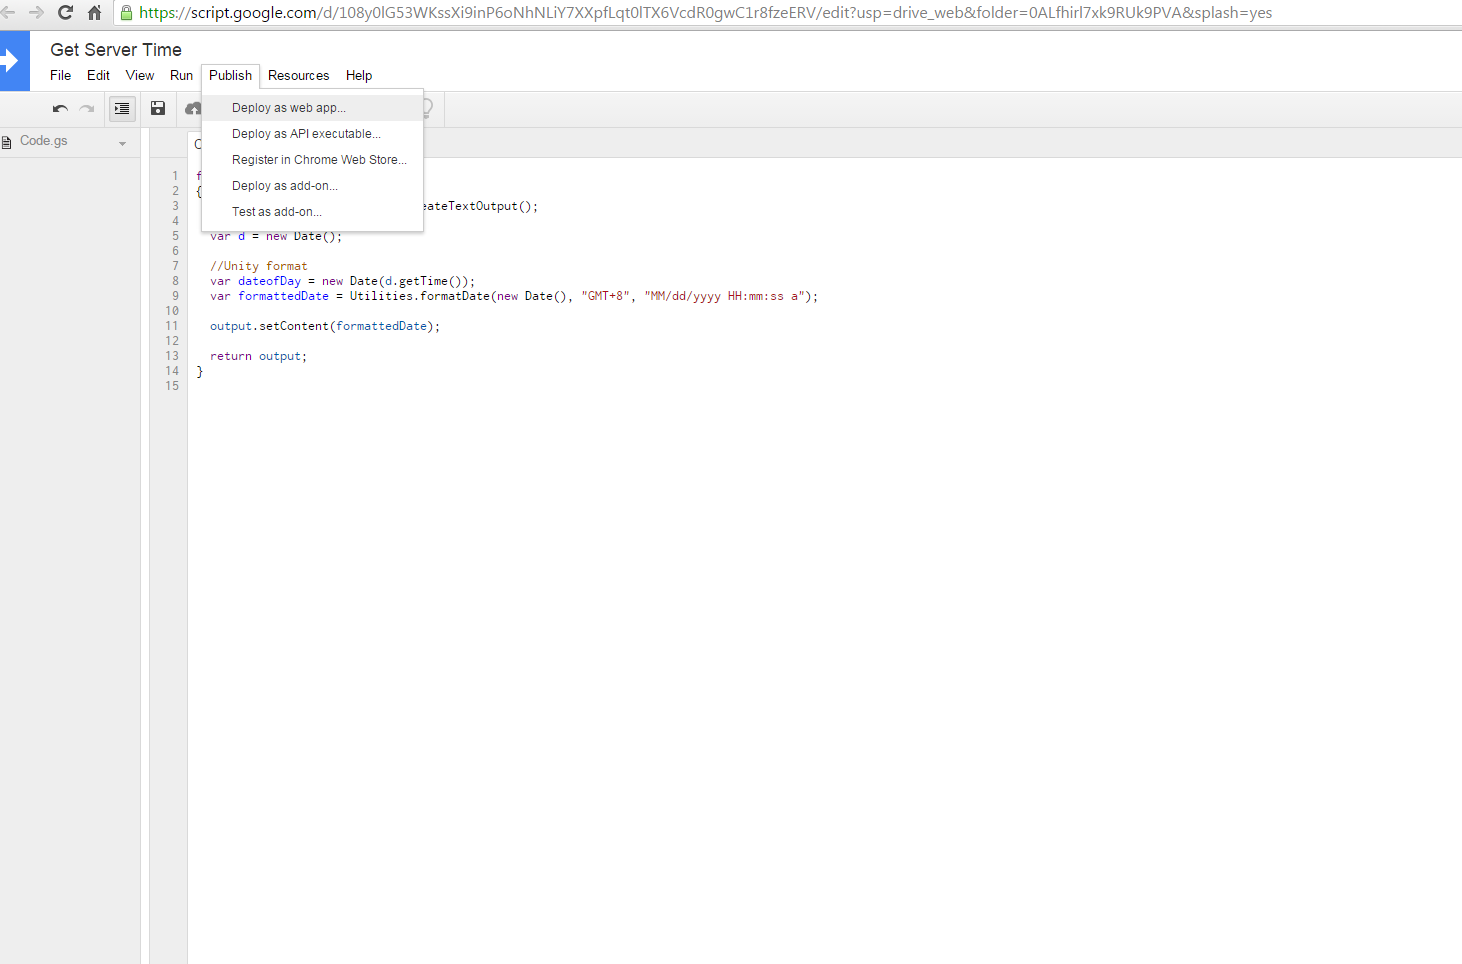 Easy get server time using google script - Unity Forum